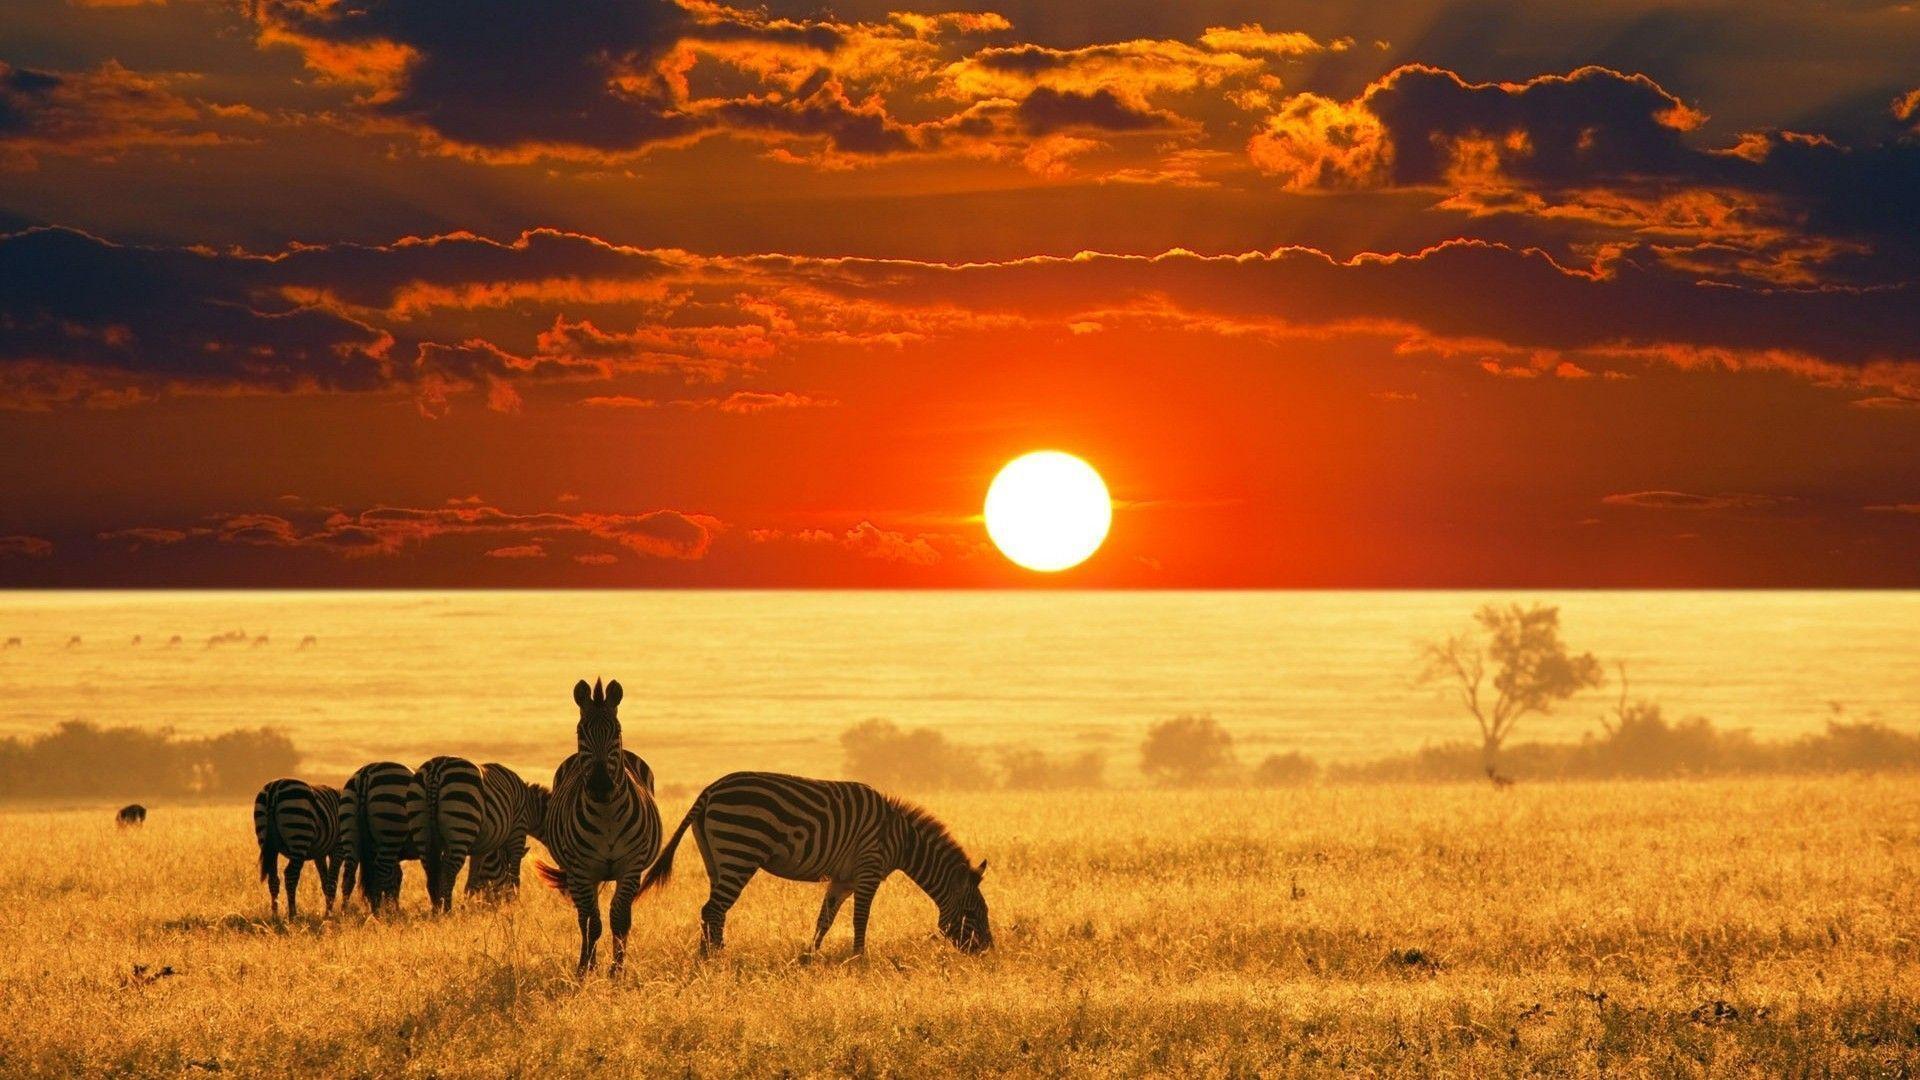 Wild Animals Safari Background Wallpaper - Animal Powericare.